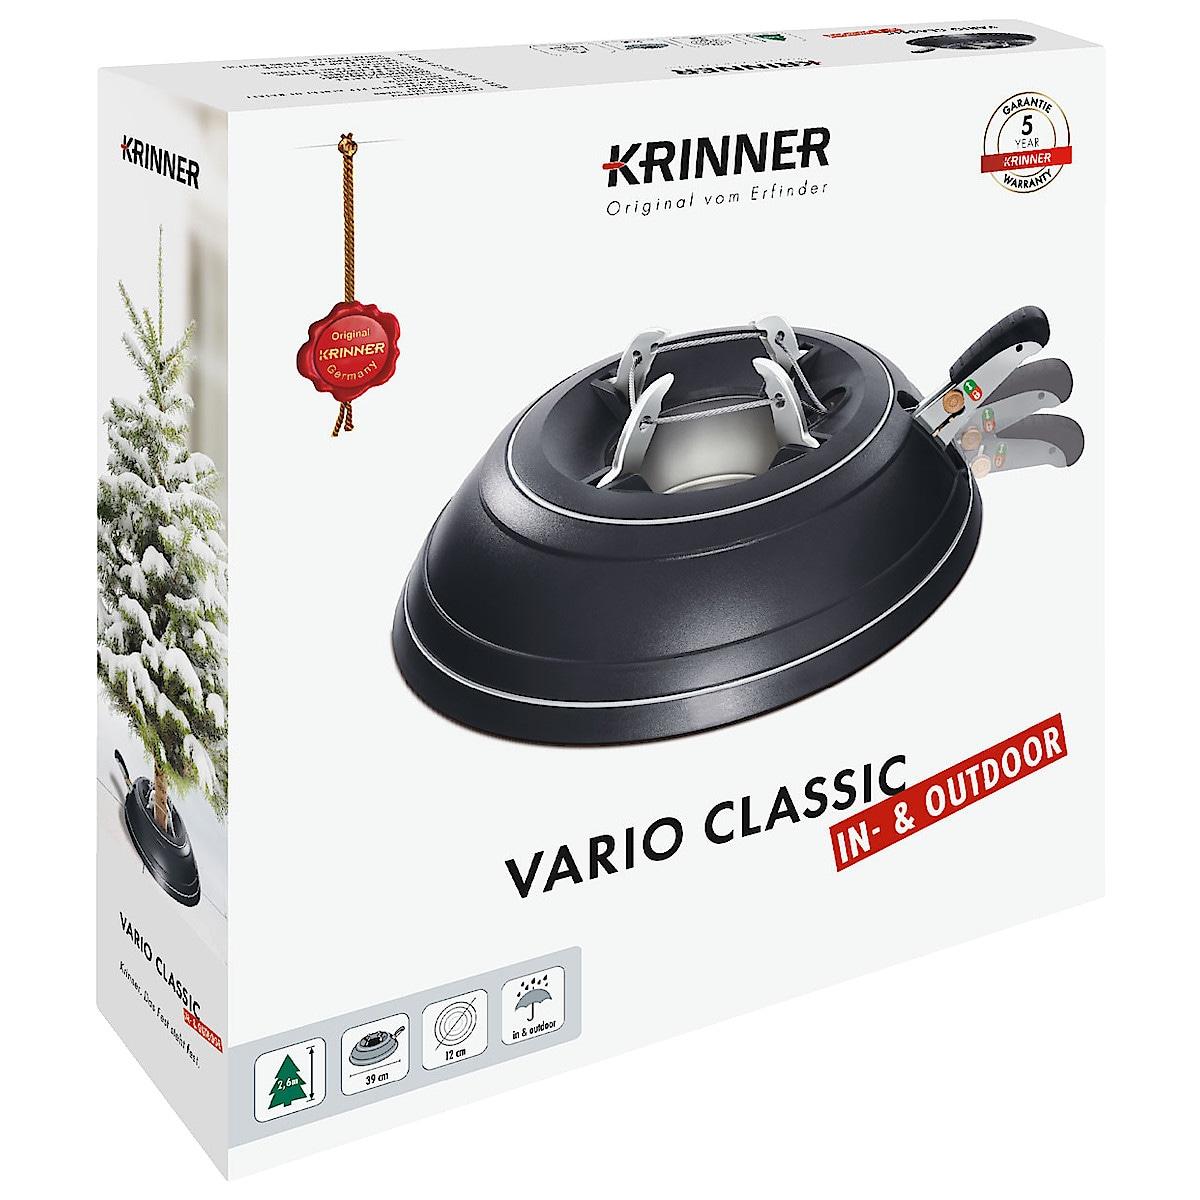 Krinner Vario Classic Christmas Tree Stand